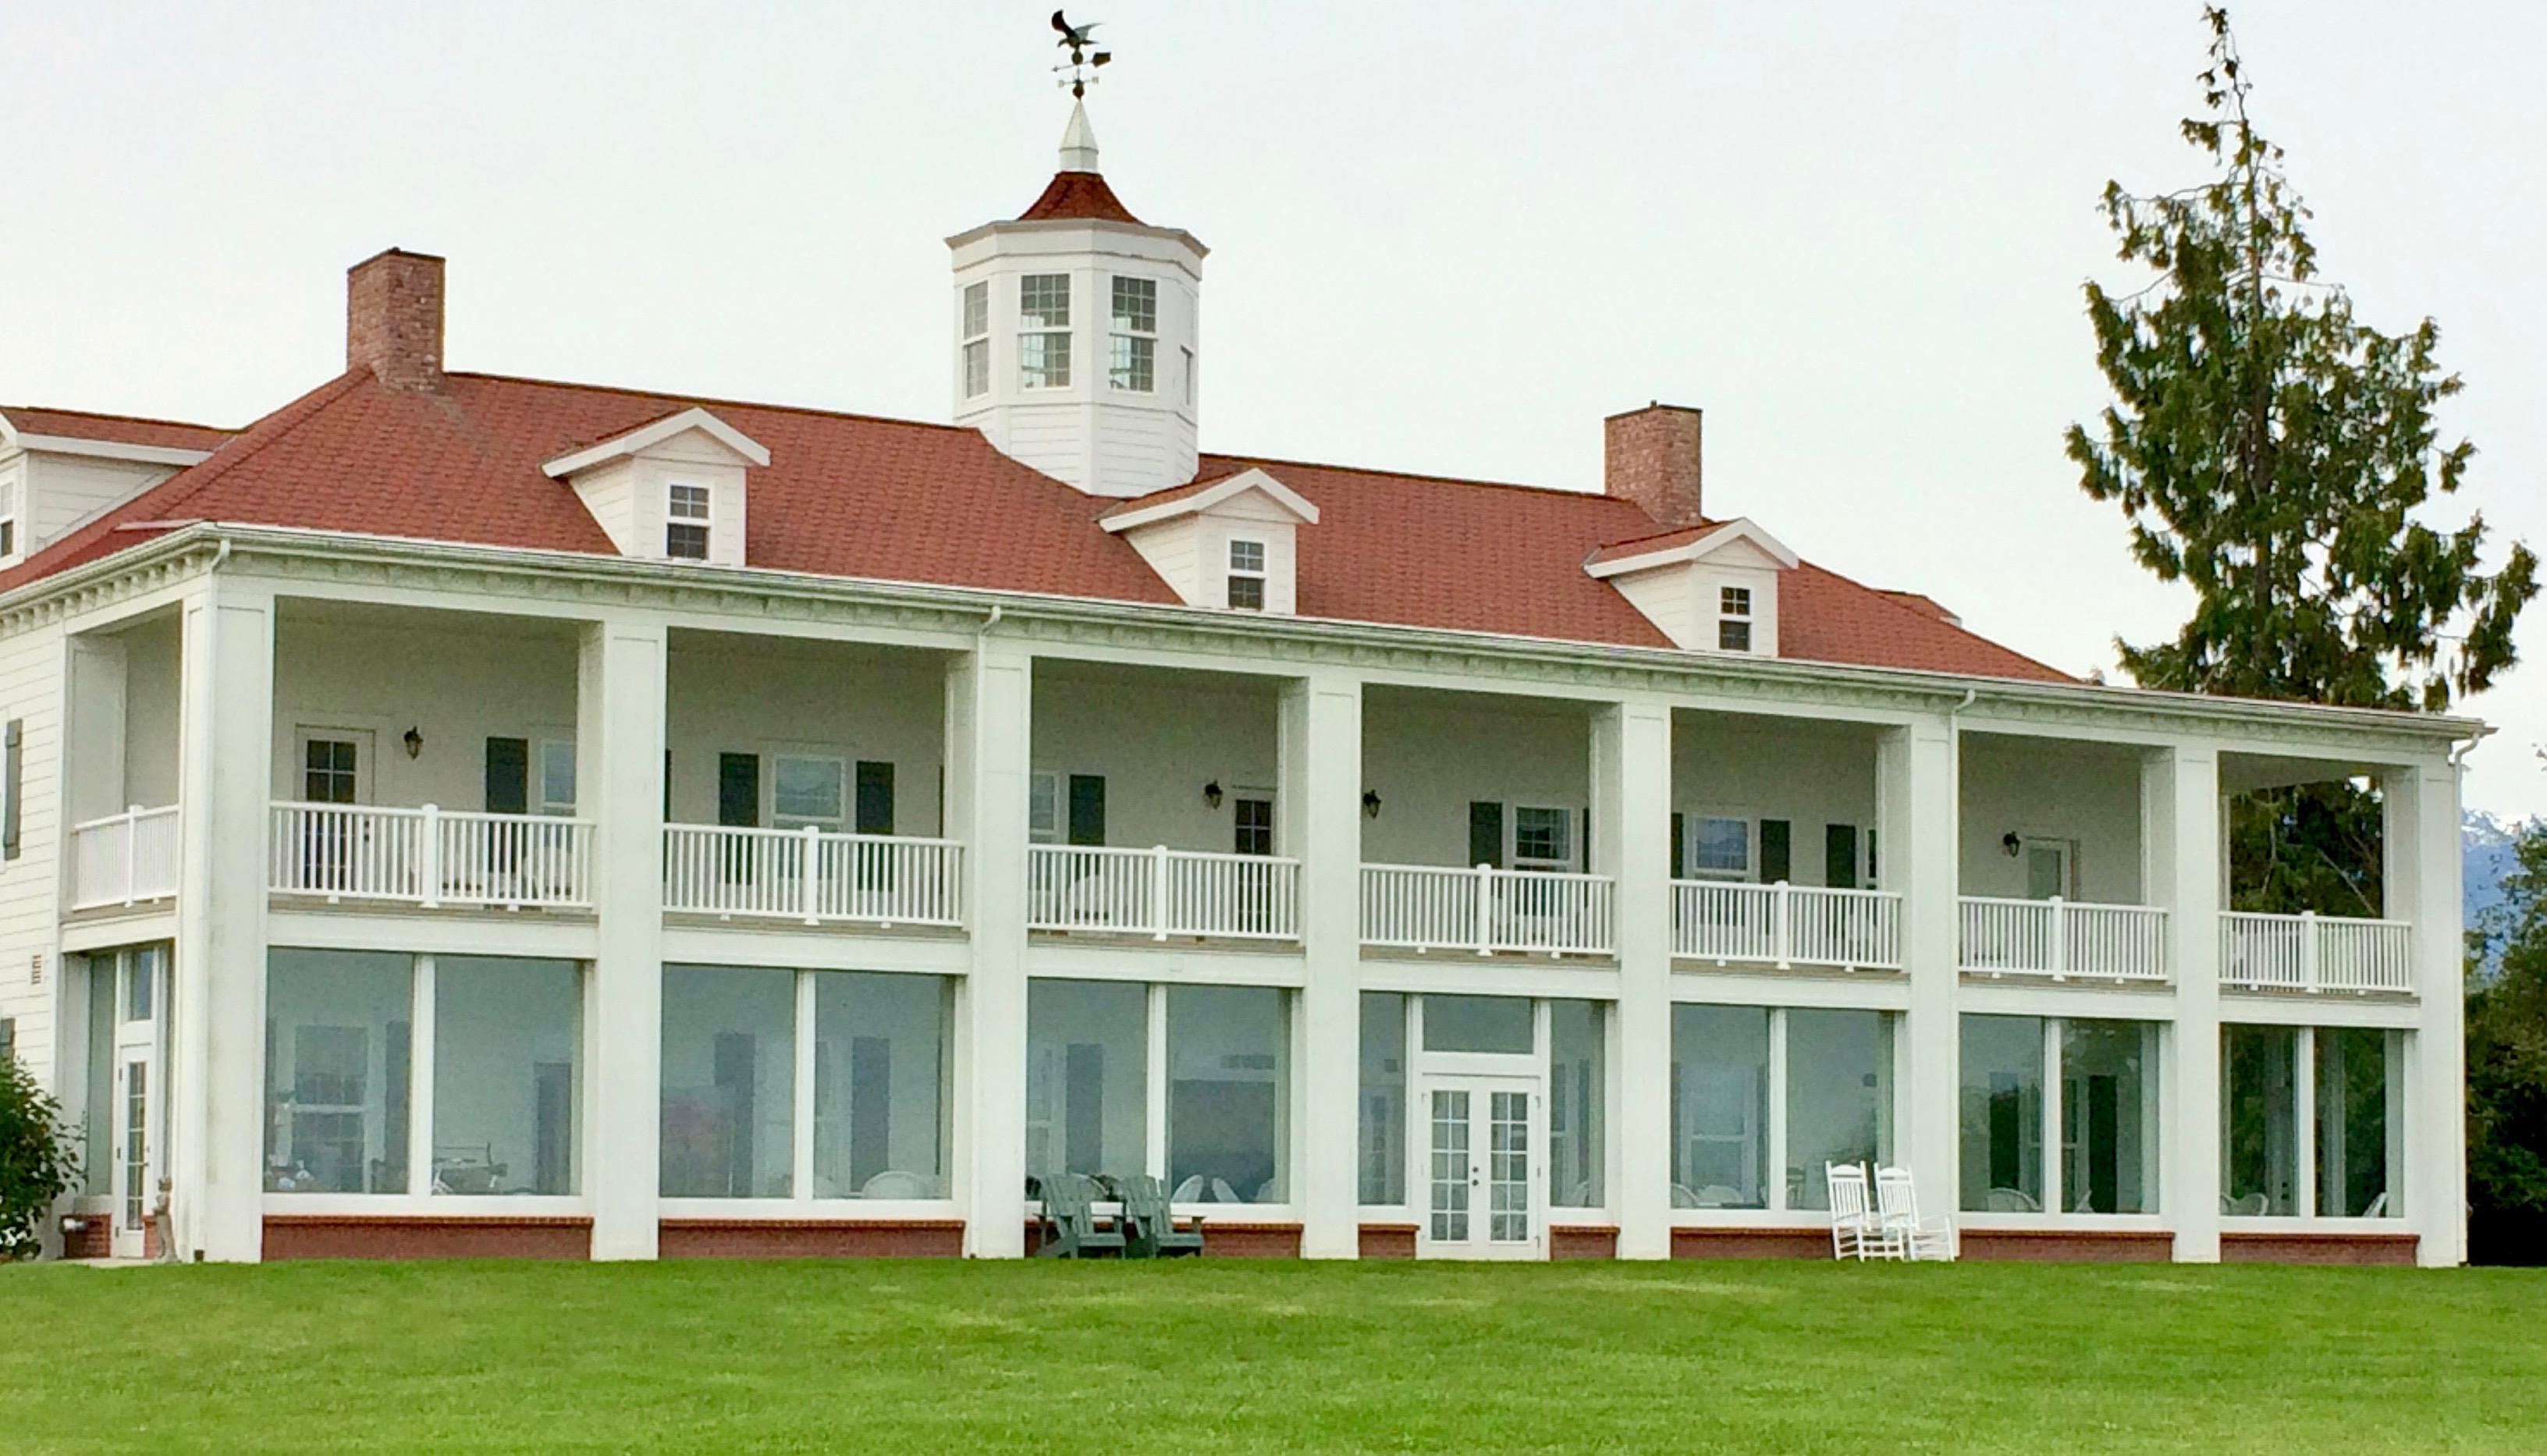 George Washington Inn & Estate BnB